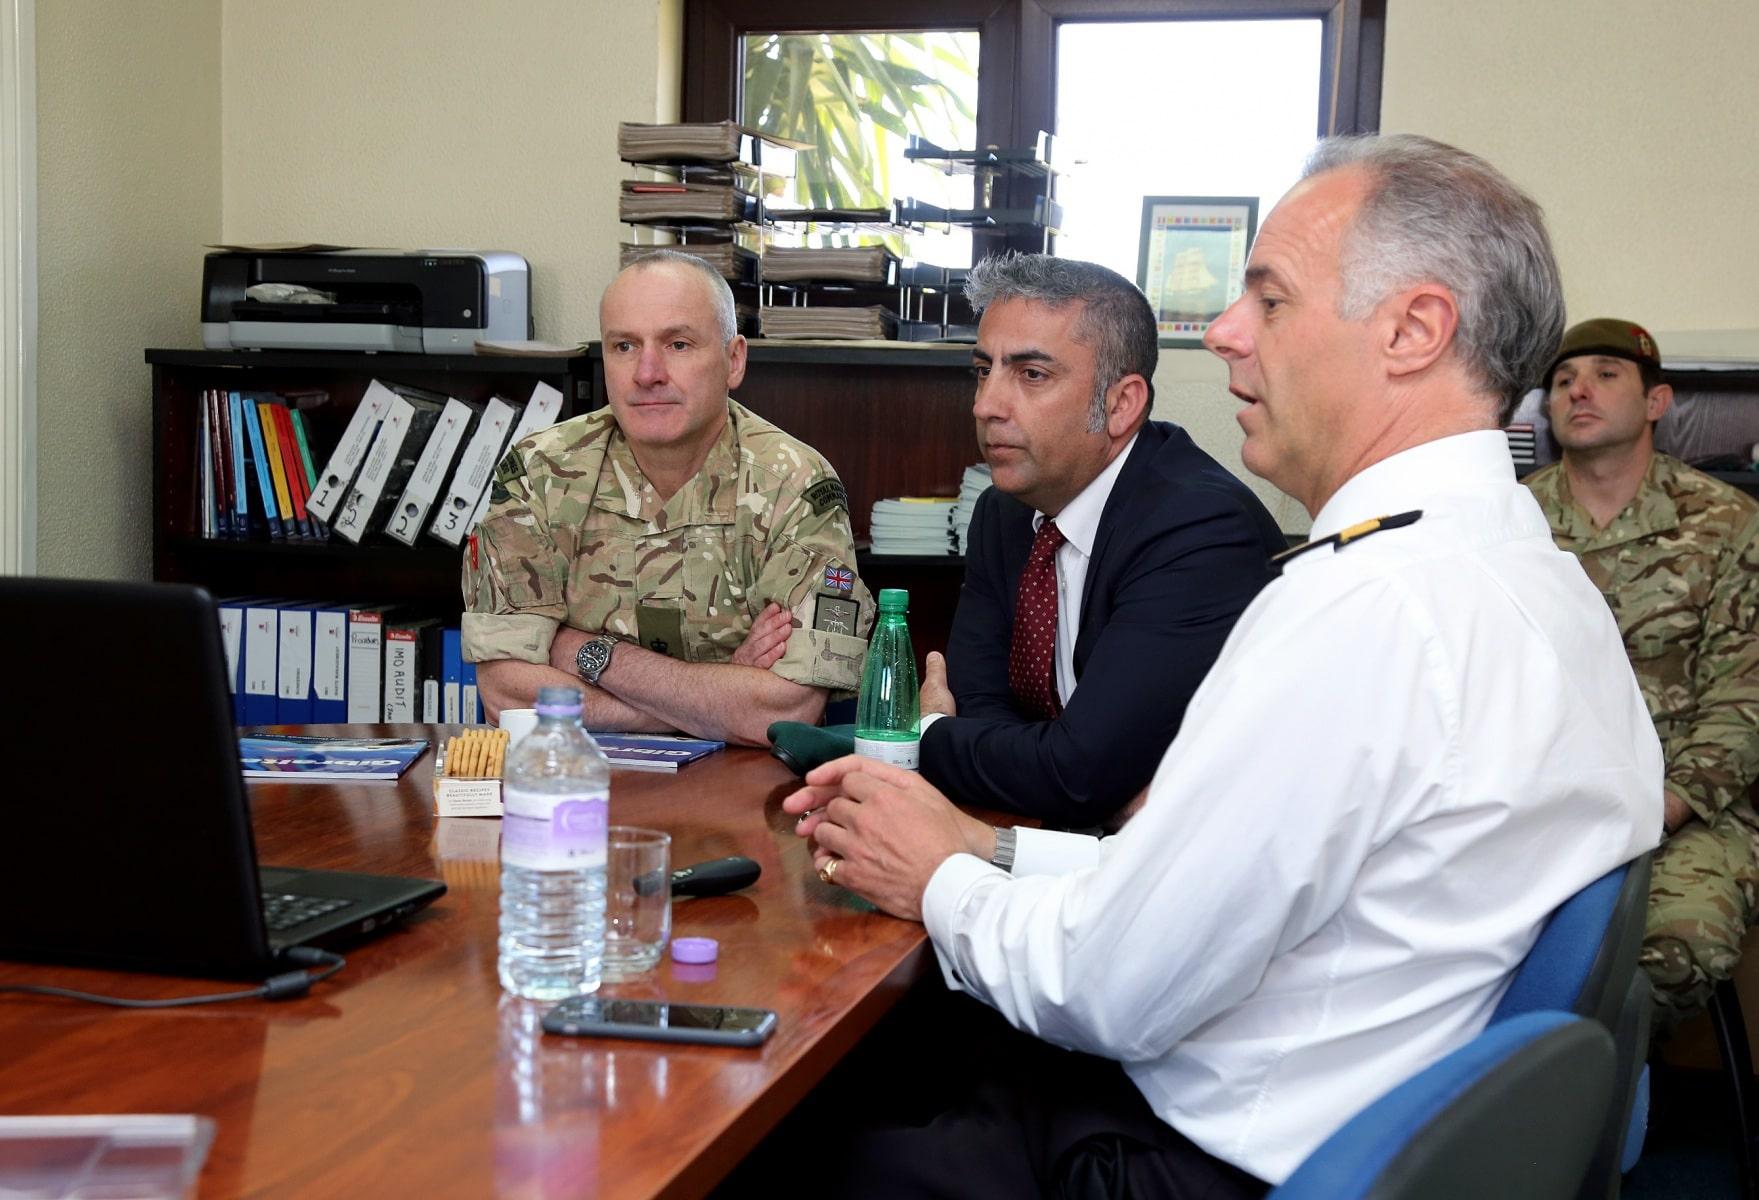 visita-oficial-del-gobernador-al-puerto-de-gibraltar_26062053582_o